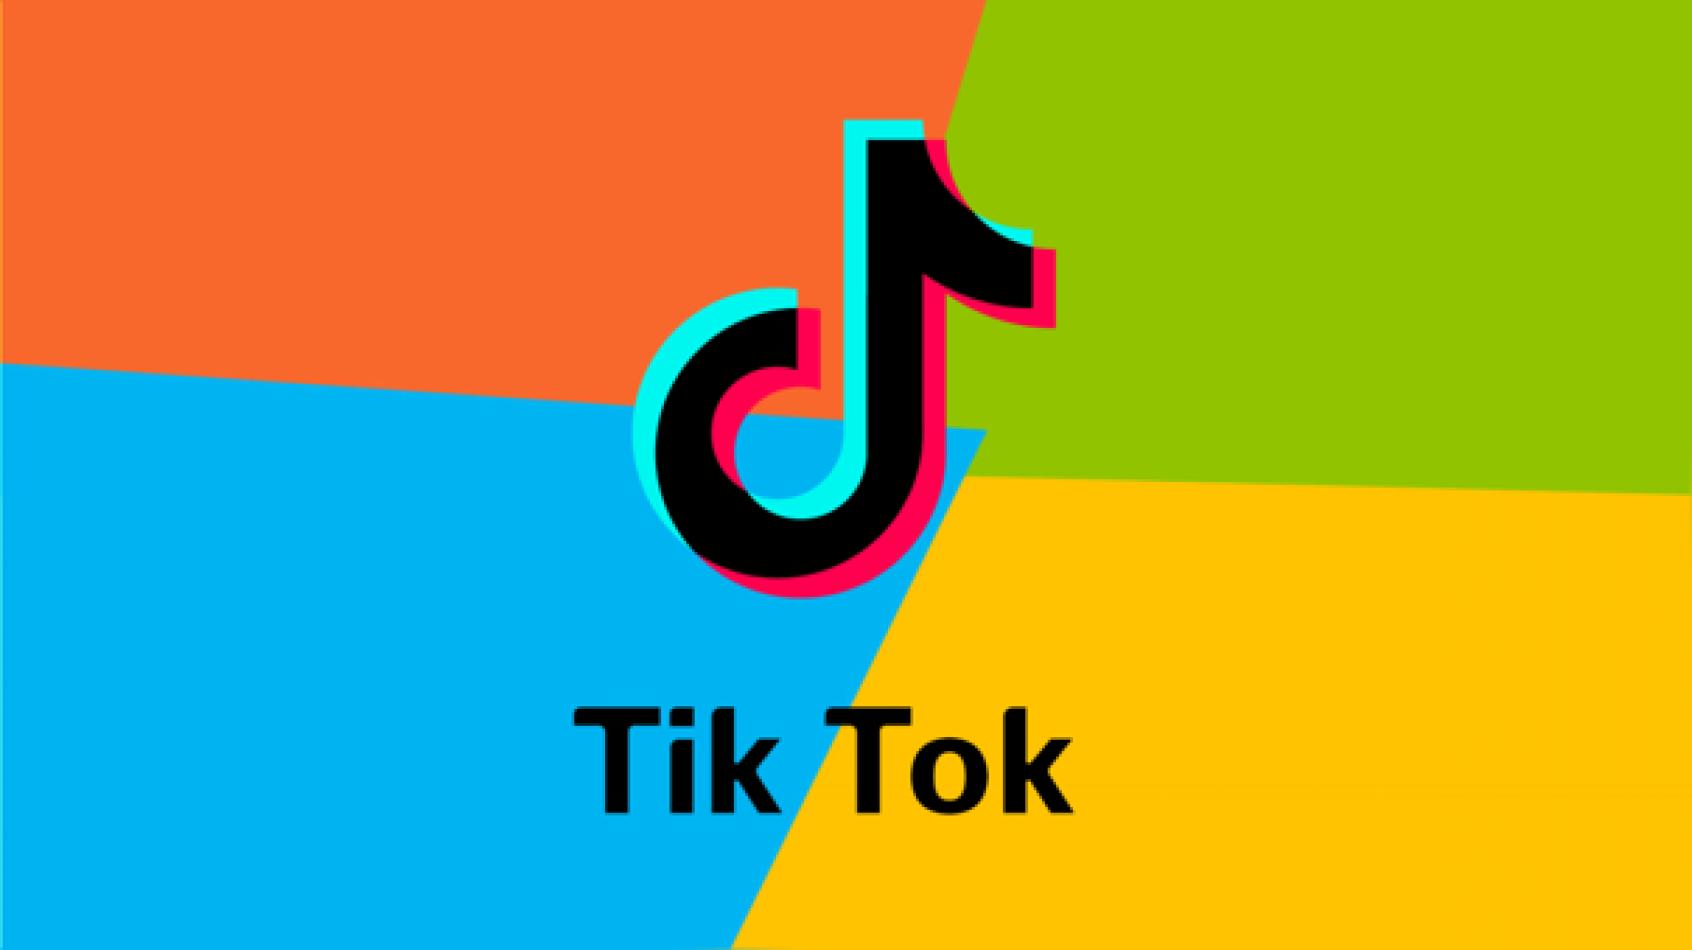 Microsoft negocia la compra de TikTok - Internacionales - Salta ...